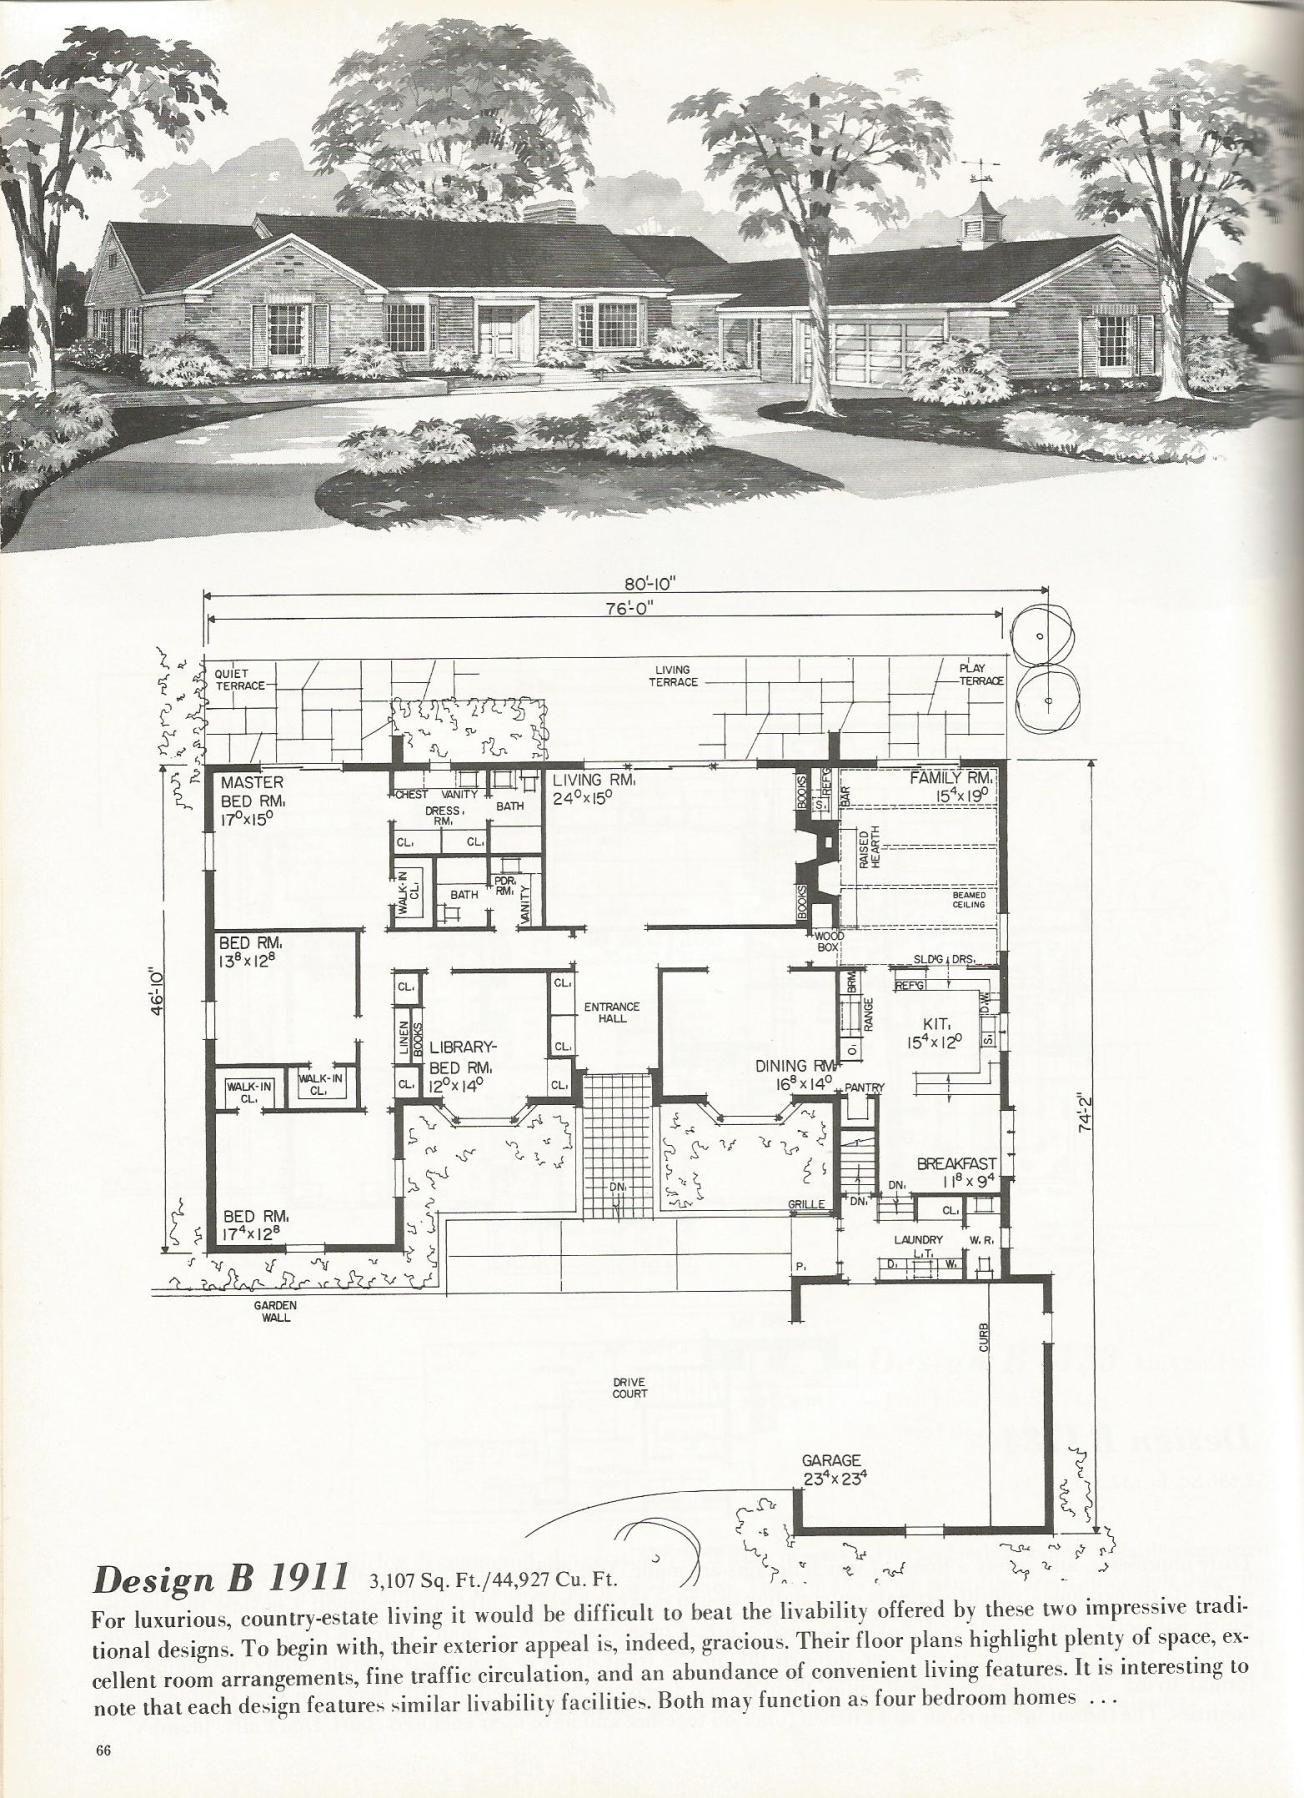 Vintage house plans, mid century homes, luxurious vintage